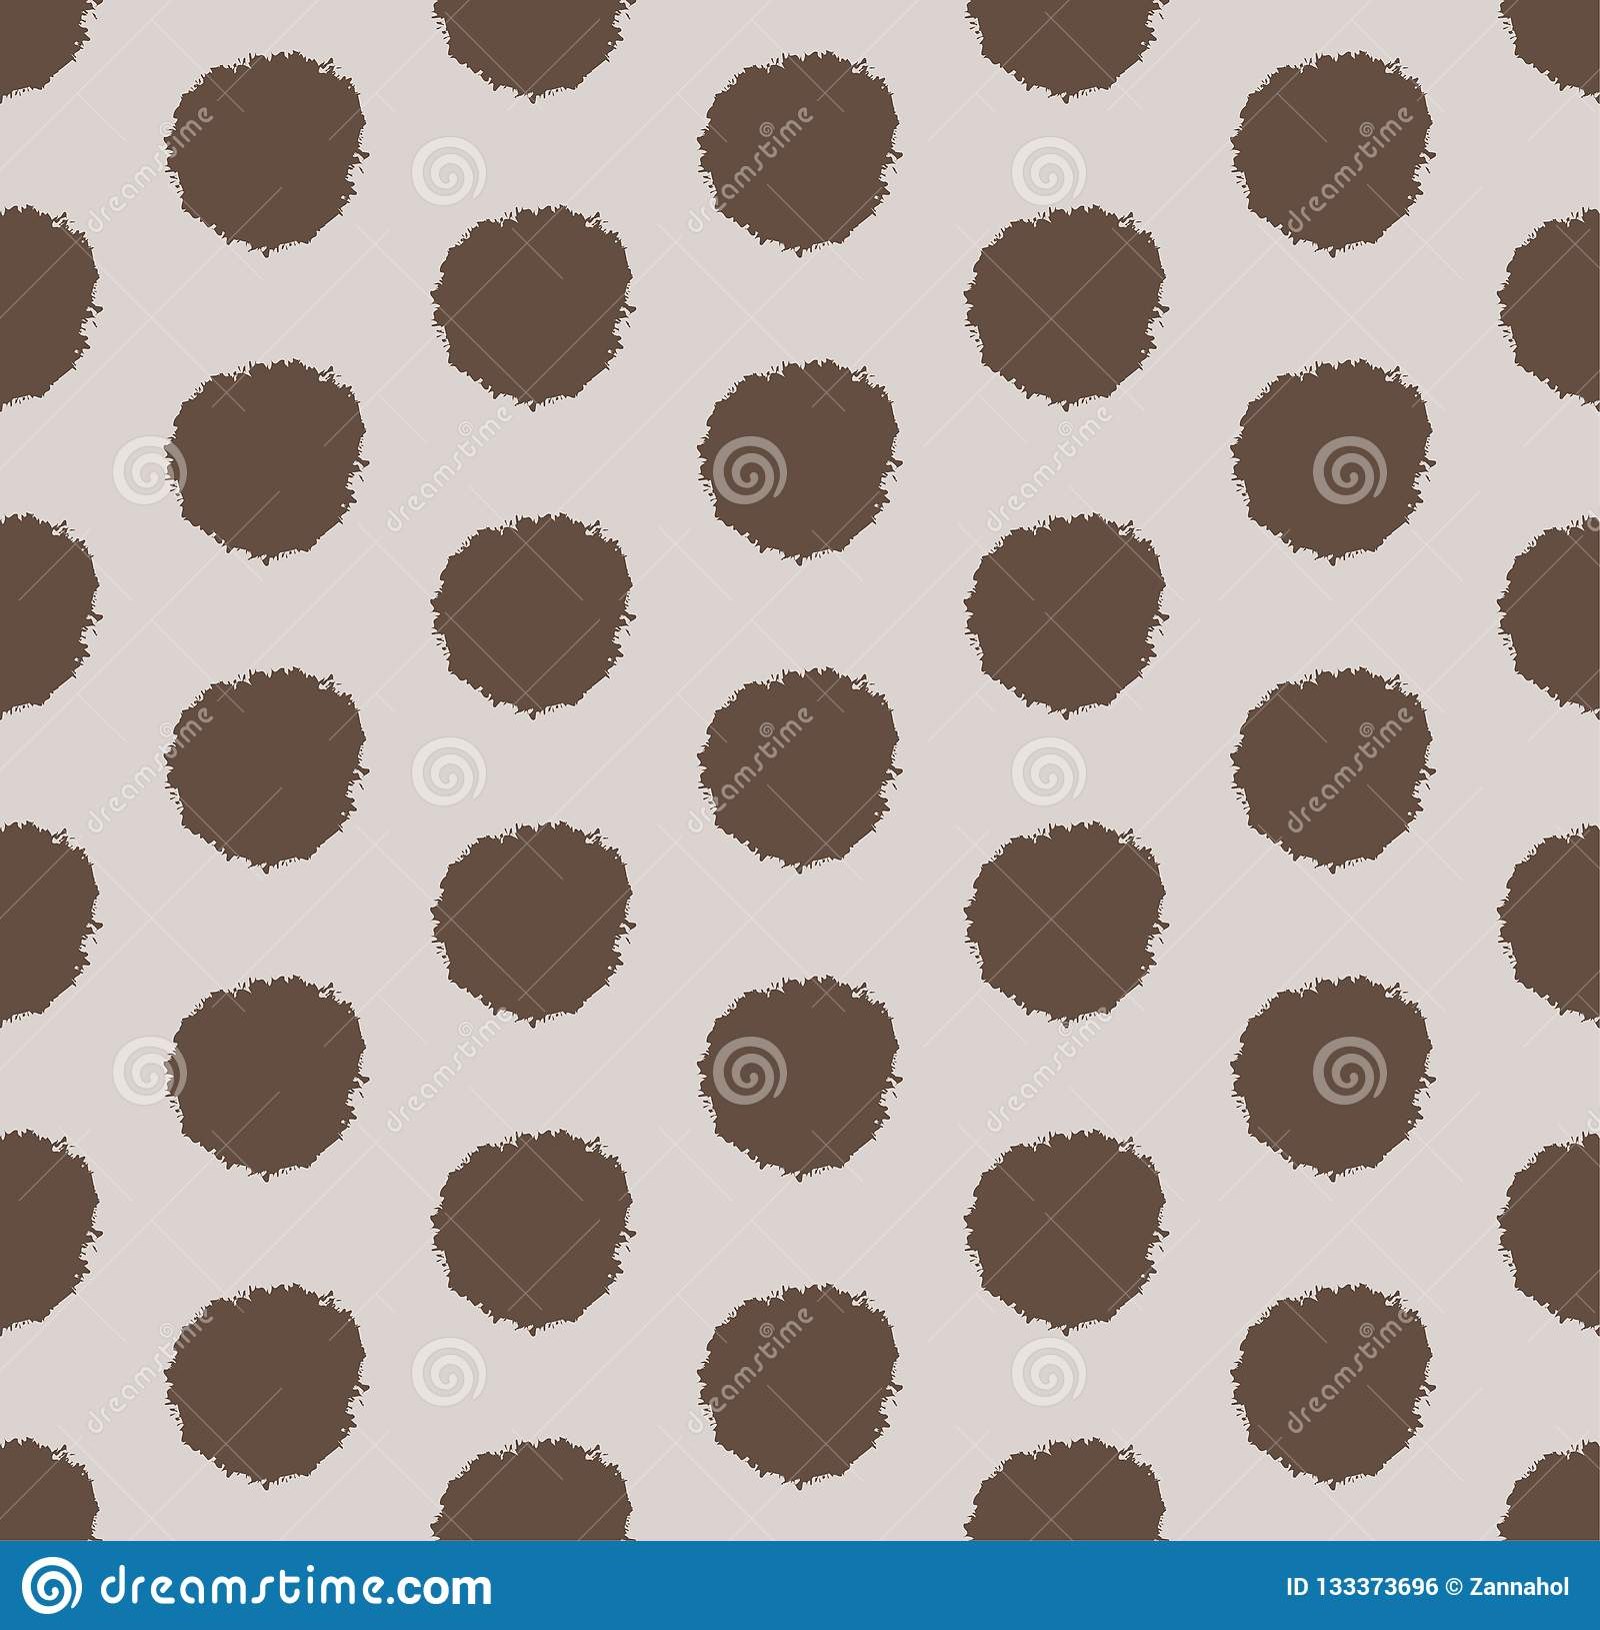 Hand Drawn Polka Dot Background With Round Brush Strokes